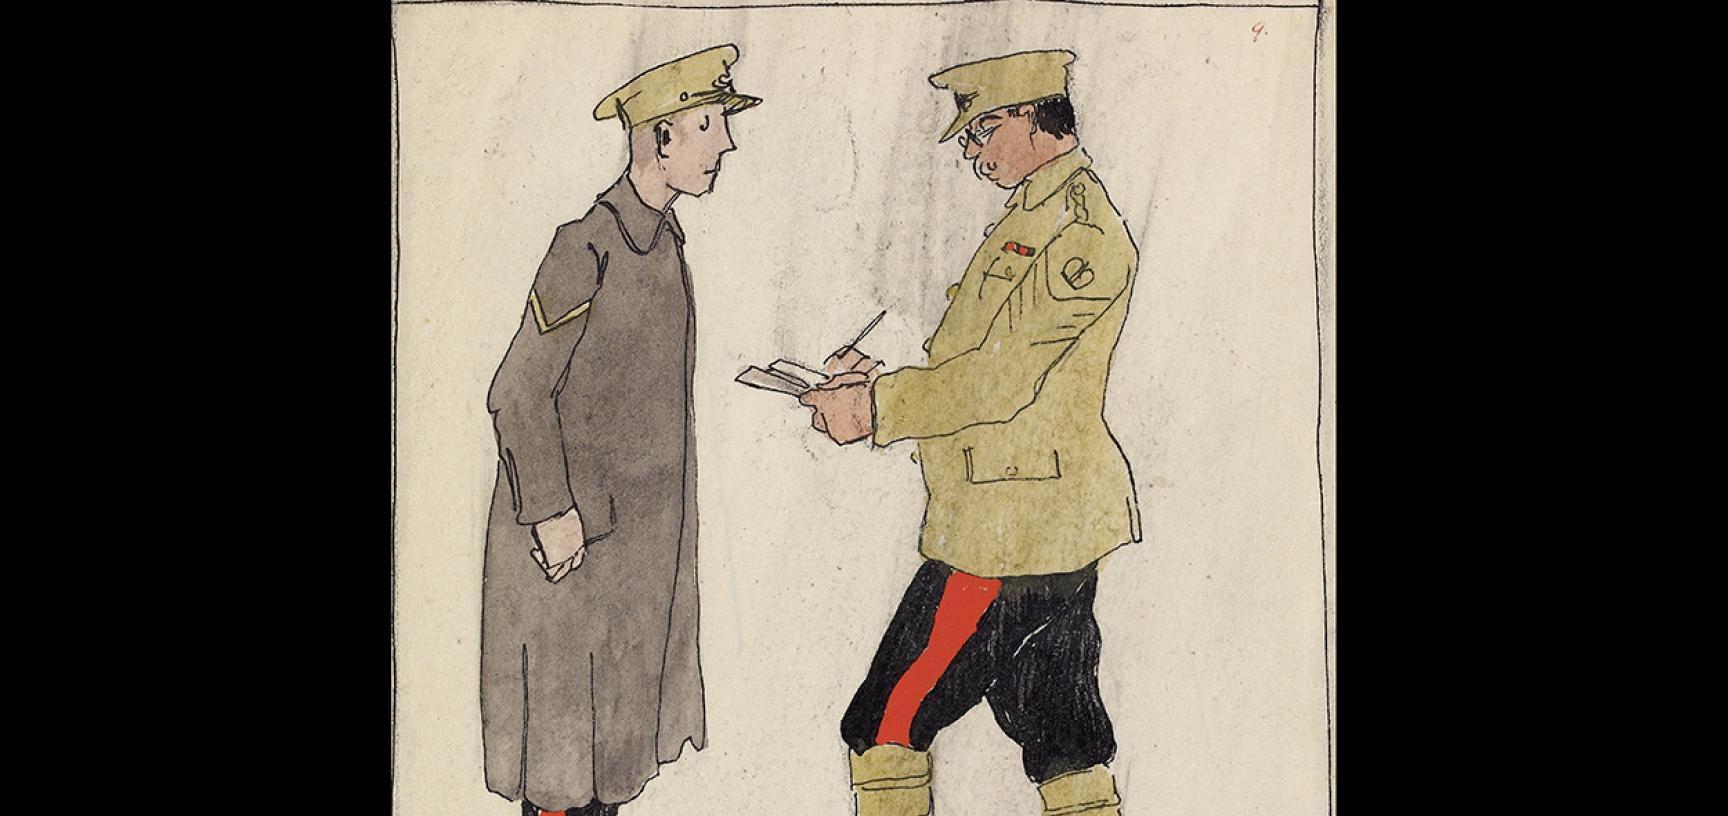 Claud Lovat Fraser, Divisional Artillery, R.F.A., December 1914, 1919 © Ashmolean Museum, Presented by Mrs Grace Lovat Fraser (the artist's widow), WA1975.101.28